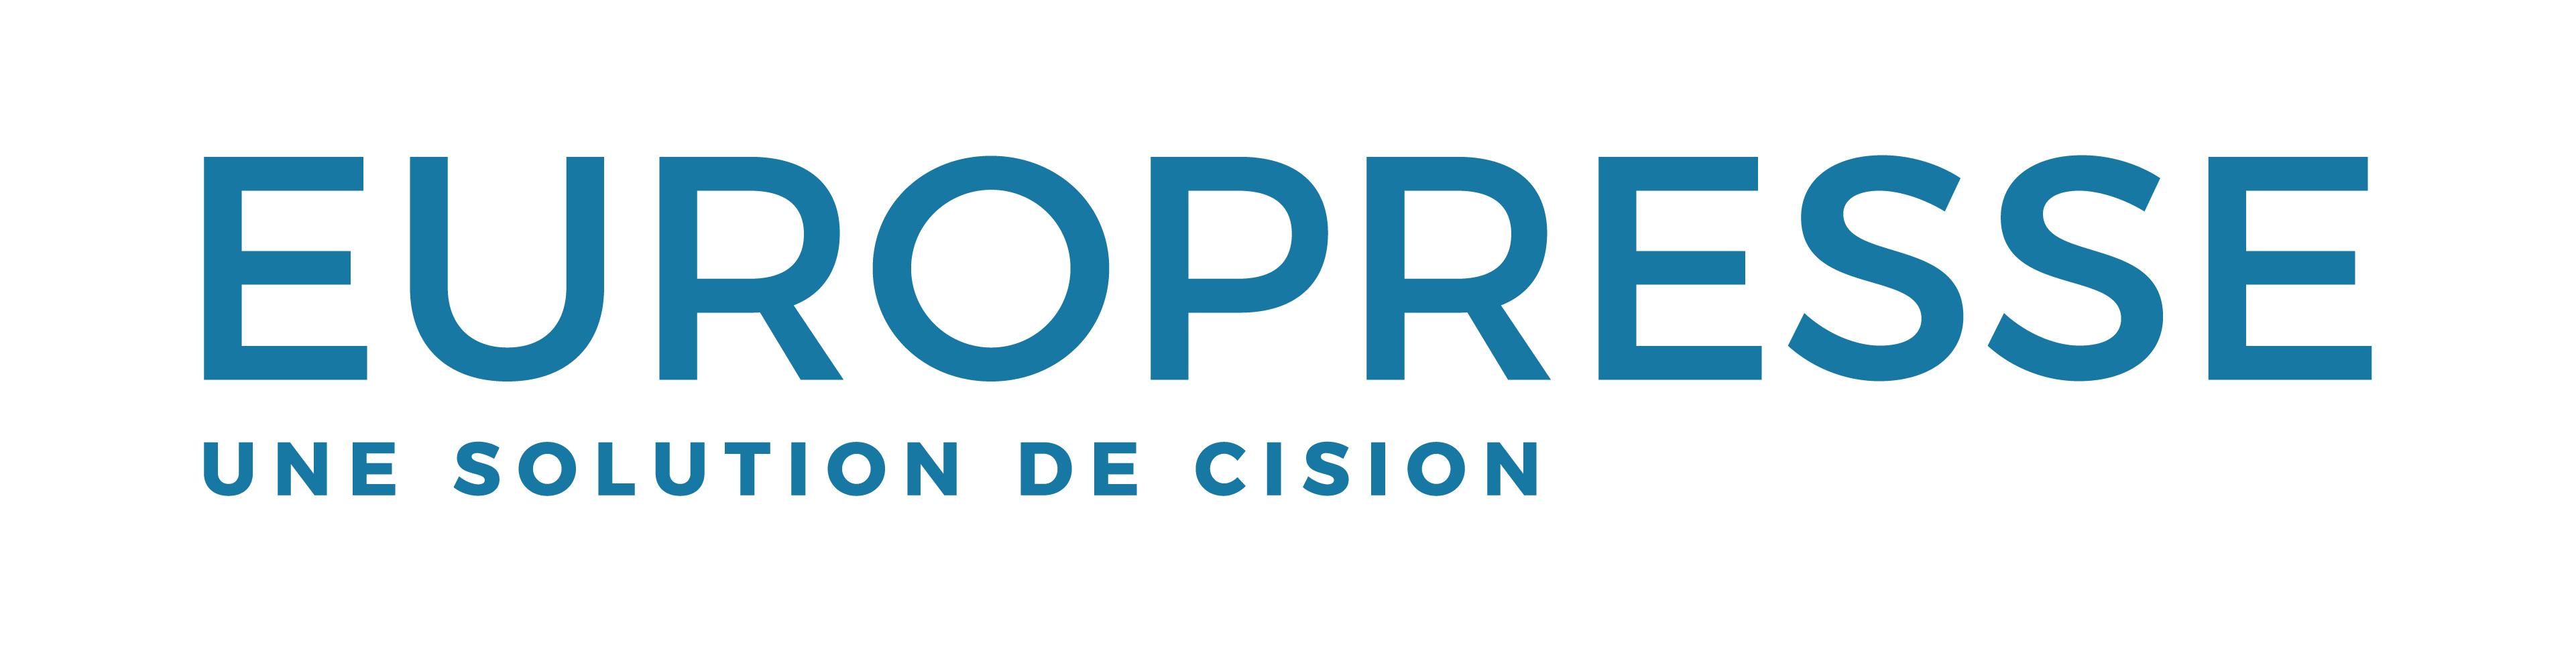 Logo Europresse 2018